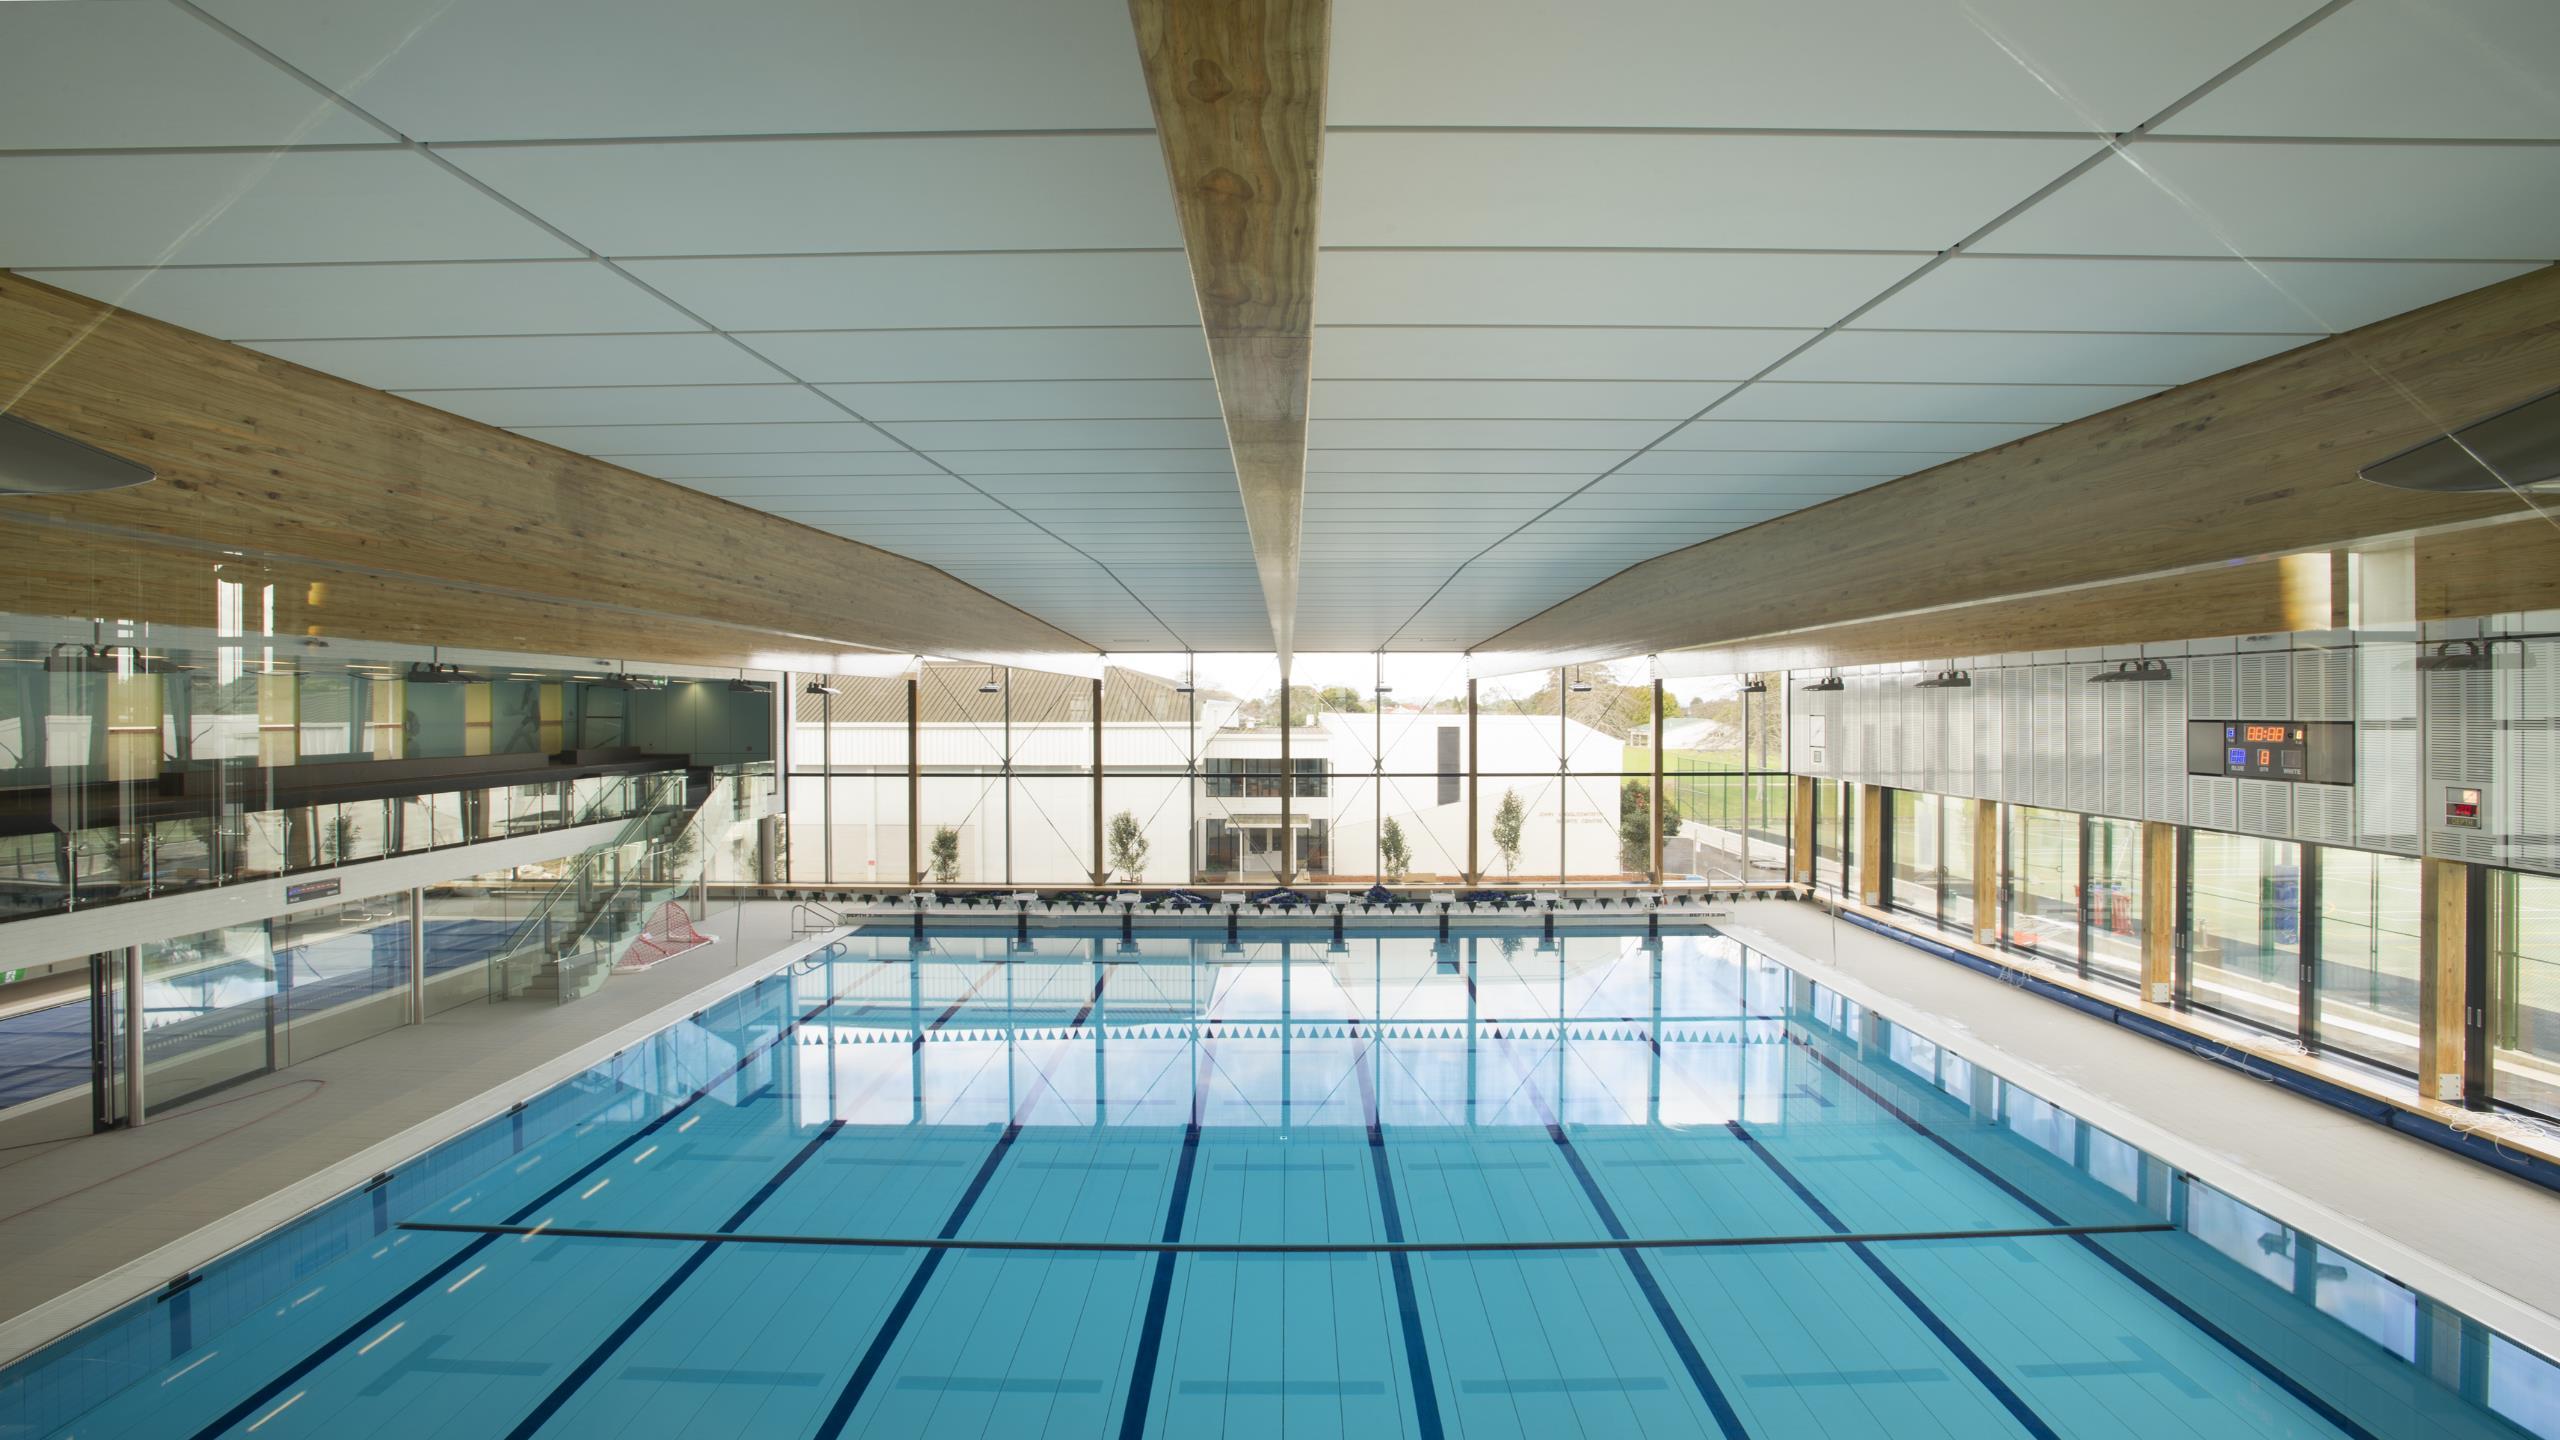 St cuthberts girls college centennial centre case study for Pool design school